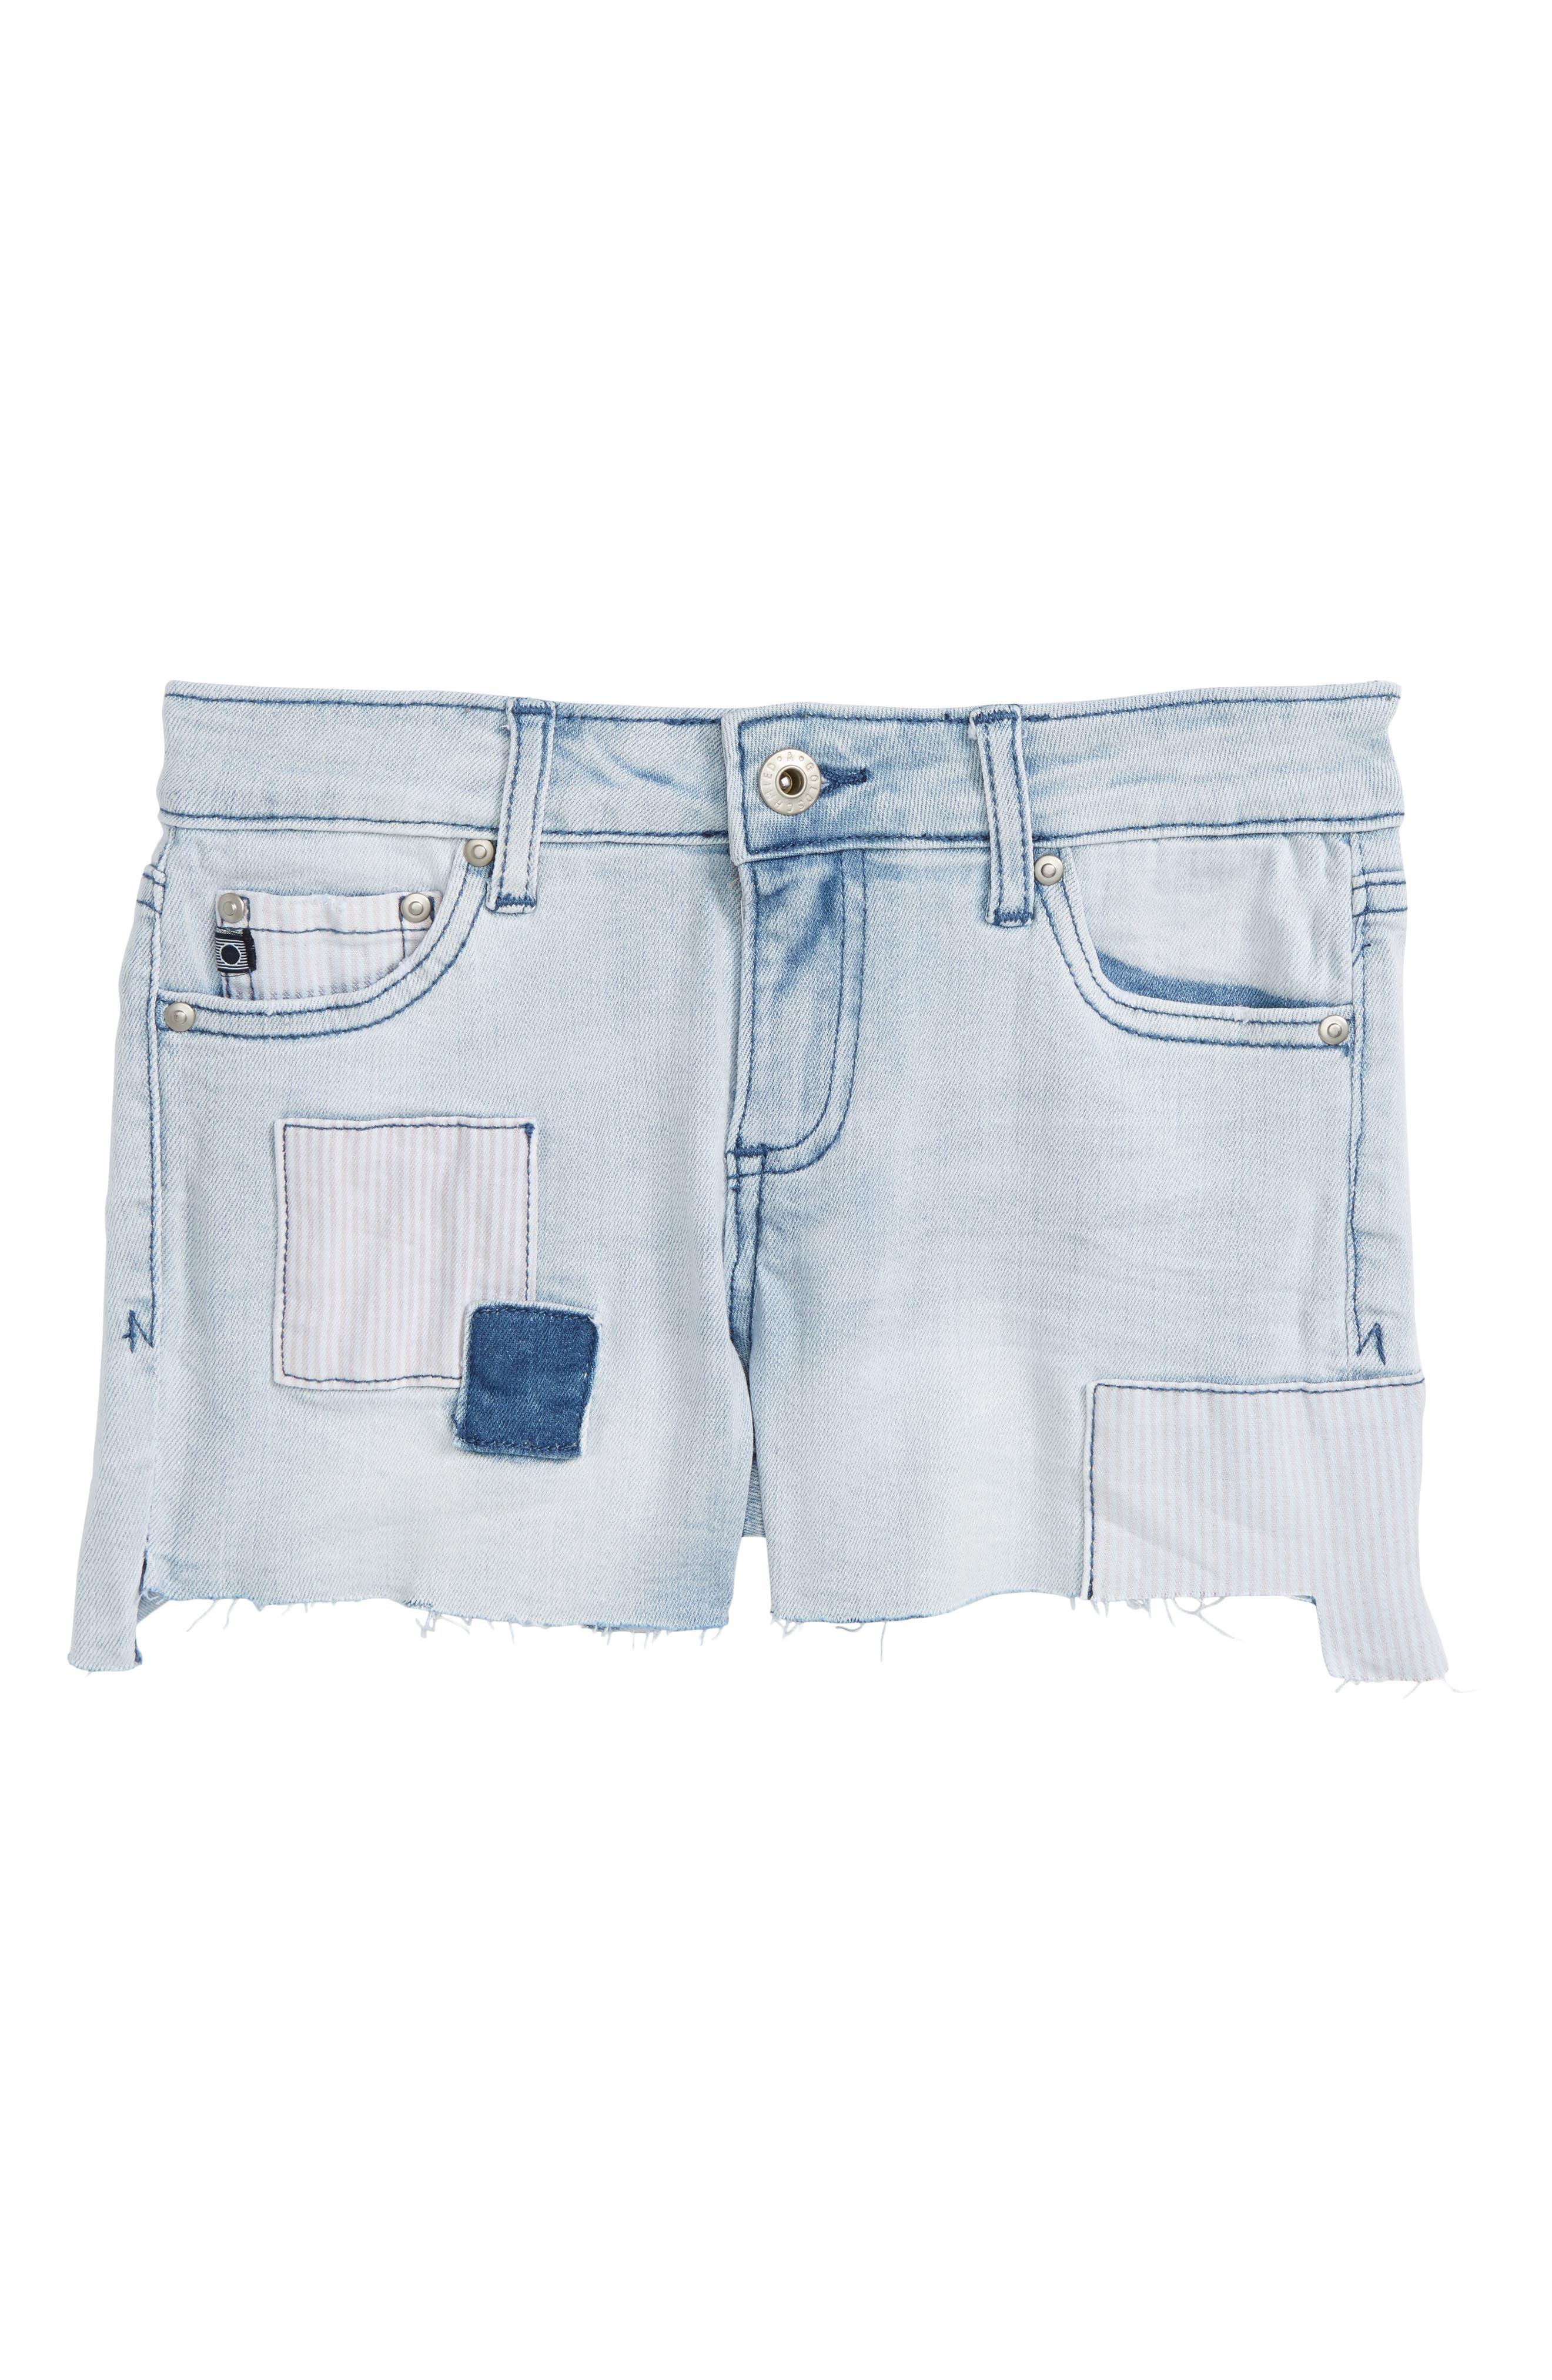 ag adriano goldschmied kids The Tarni Patch Cutoff Denim Shorts (Big Girls)